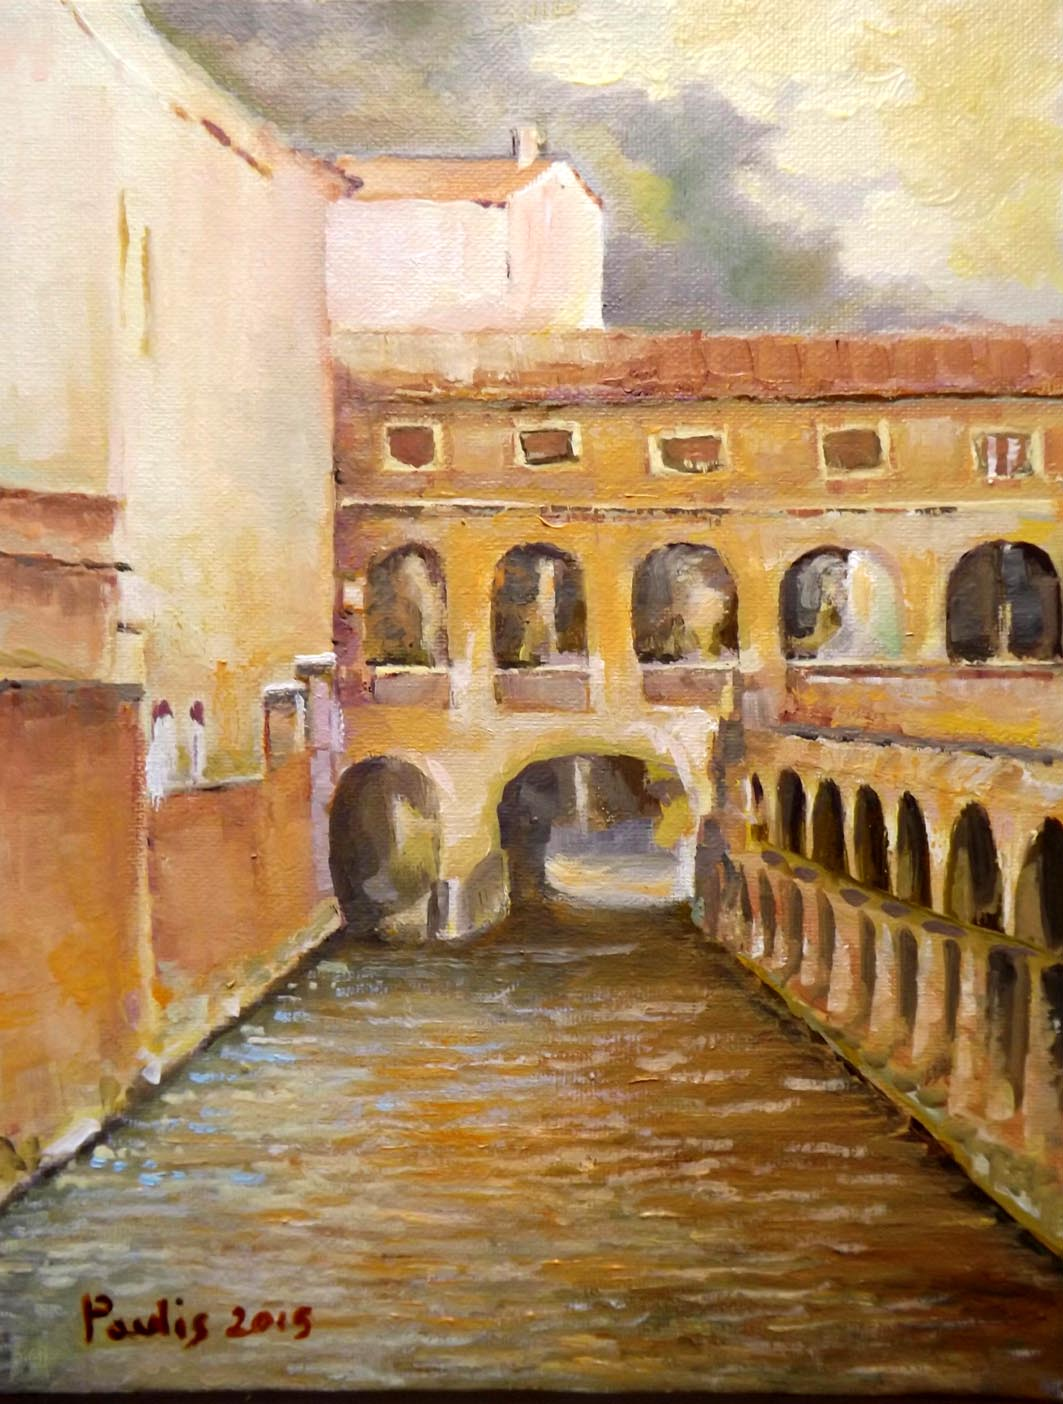 Natale Paulis - LungoRio - dipinto a olio